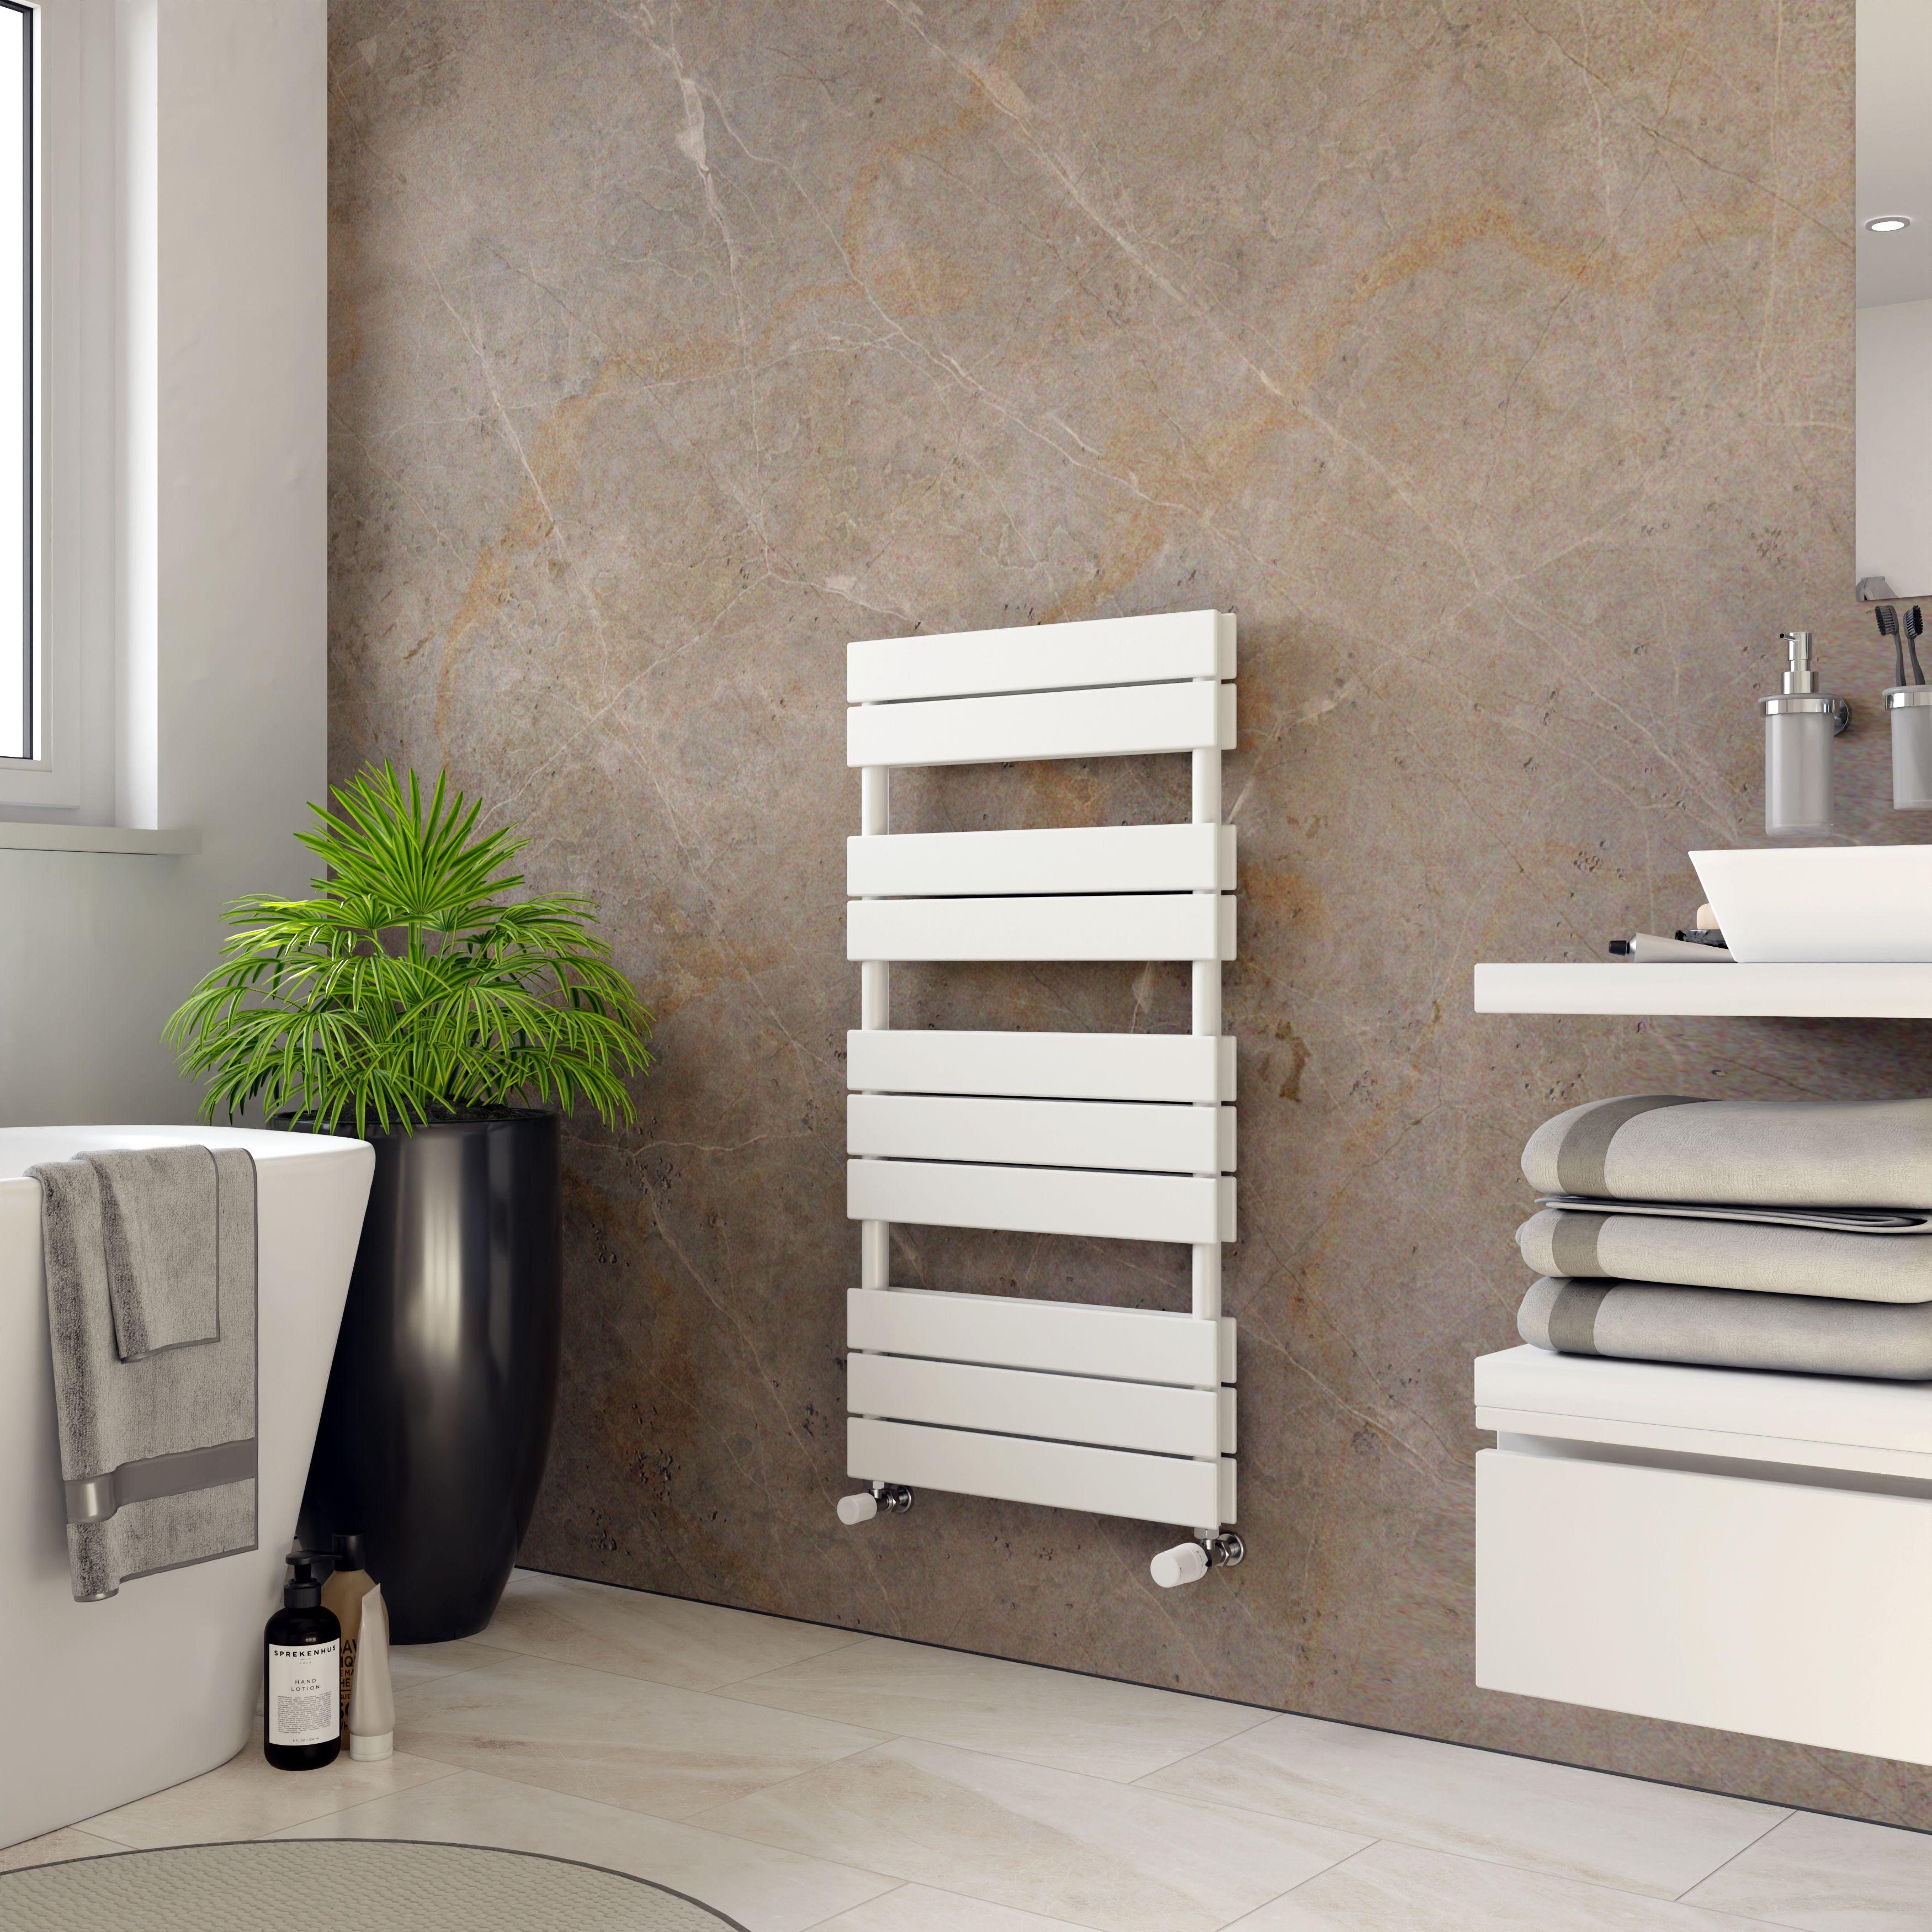 Ximax White Panel radiator (H)970mm (W)500mm